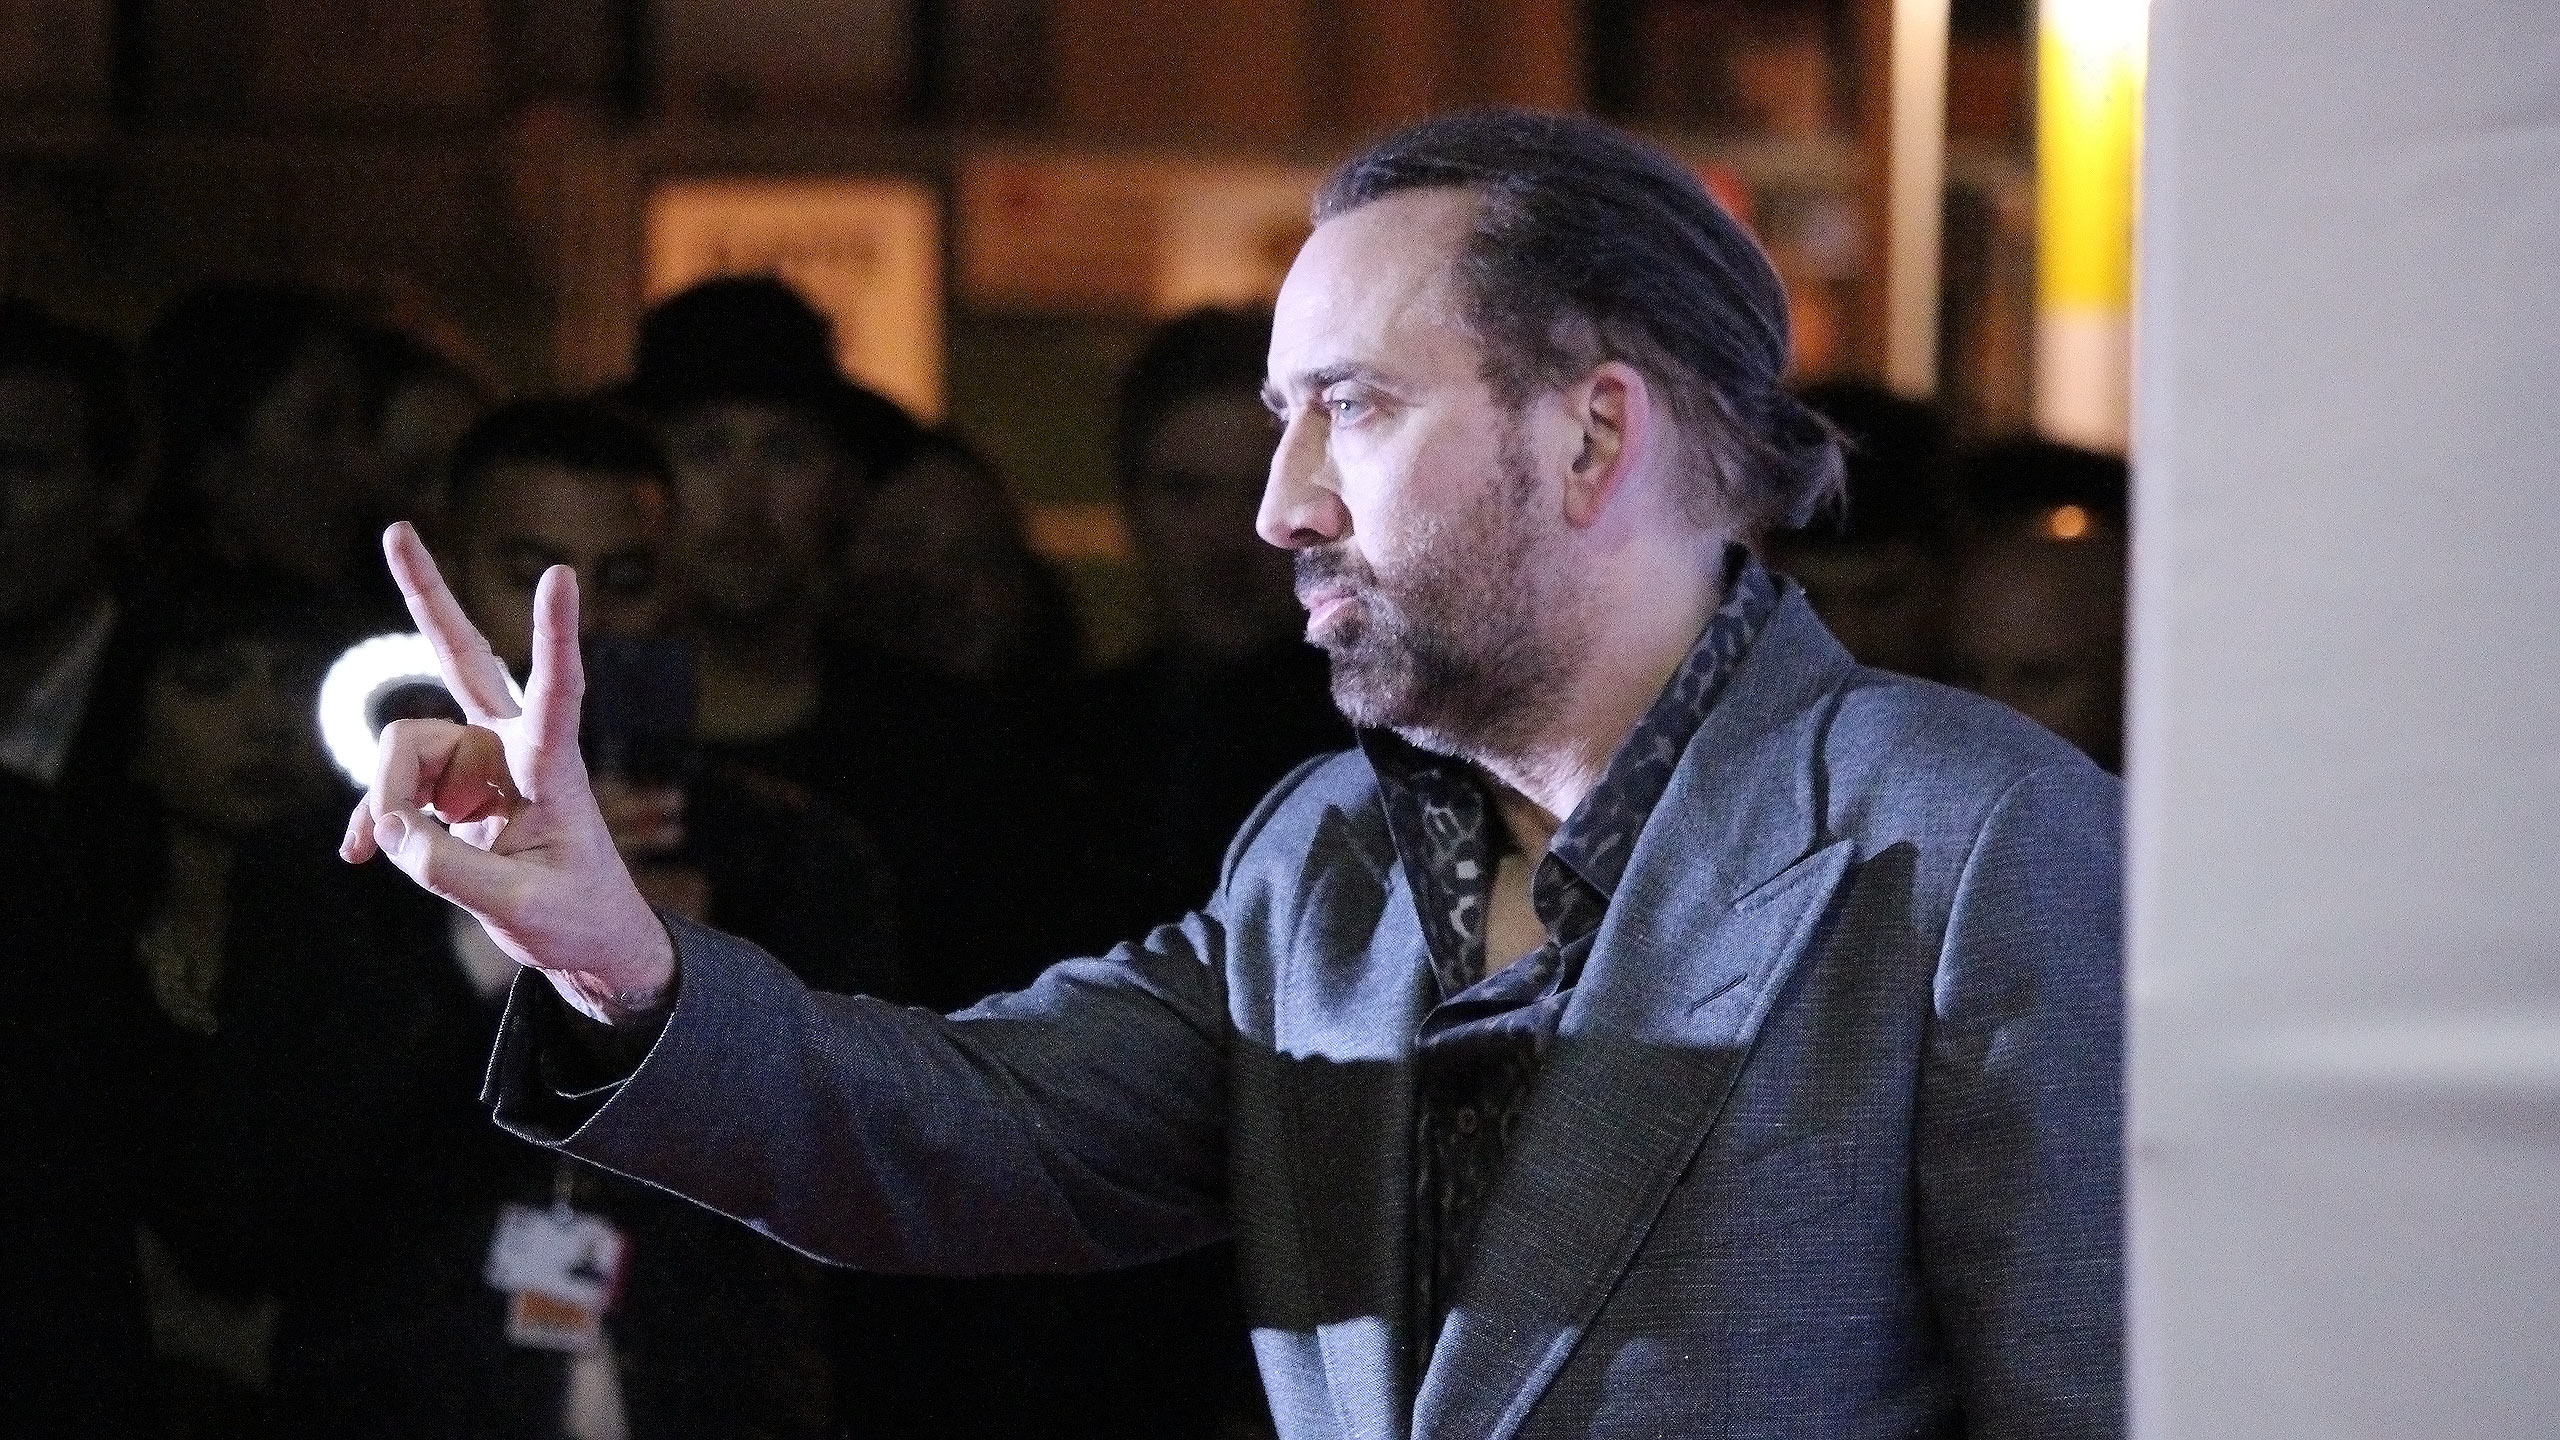 TIFF 2017 Nicholas Cage Peace sign Photo: Premila D'Sa